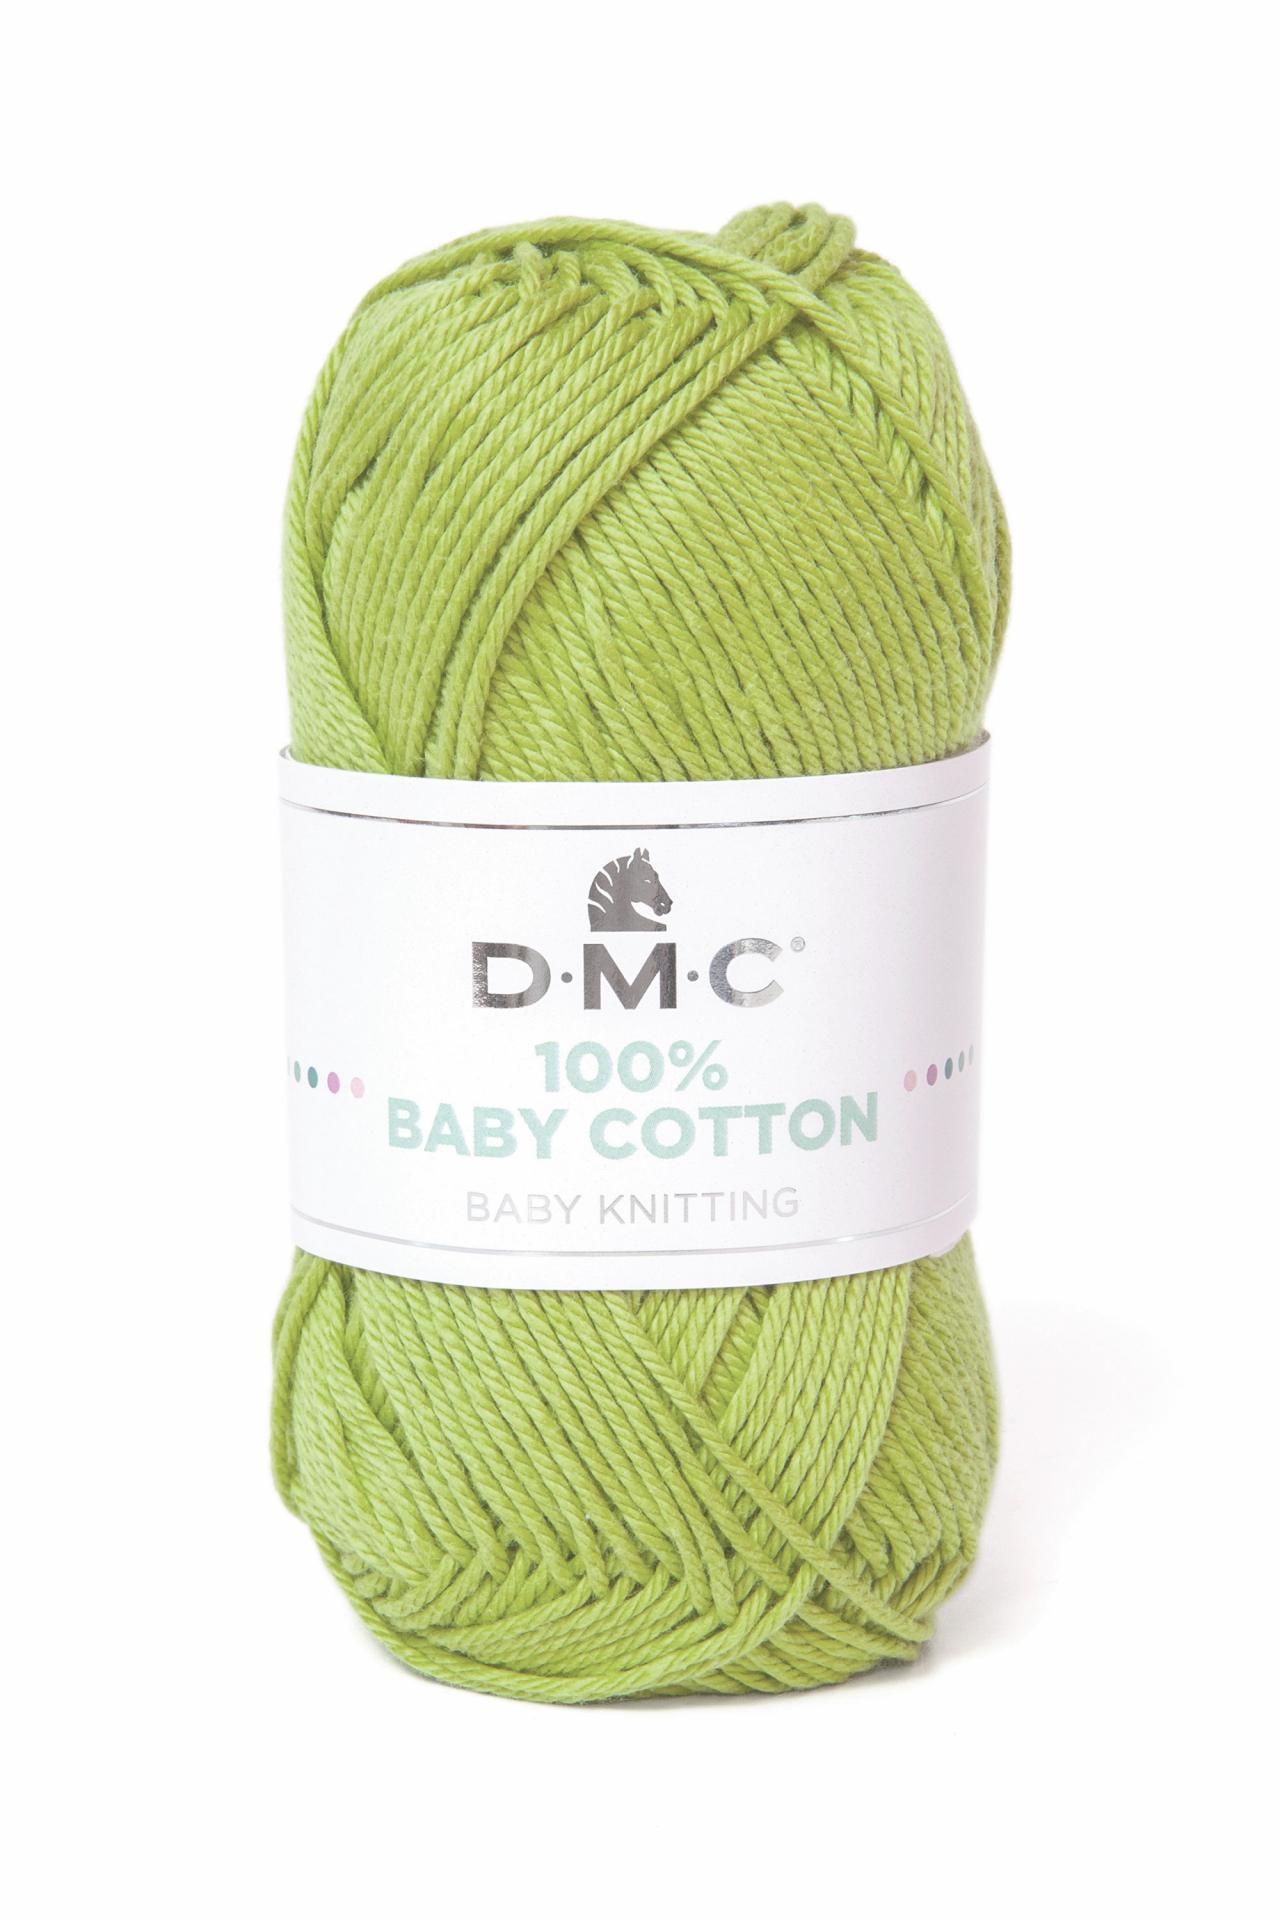 Hilo DMC 100% Baby Cotton 752 Pistacho